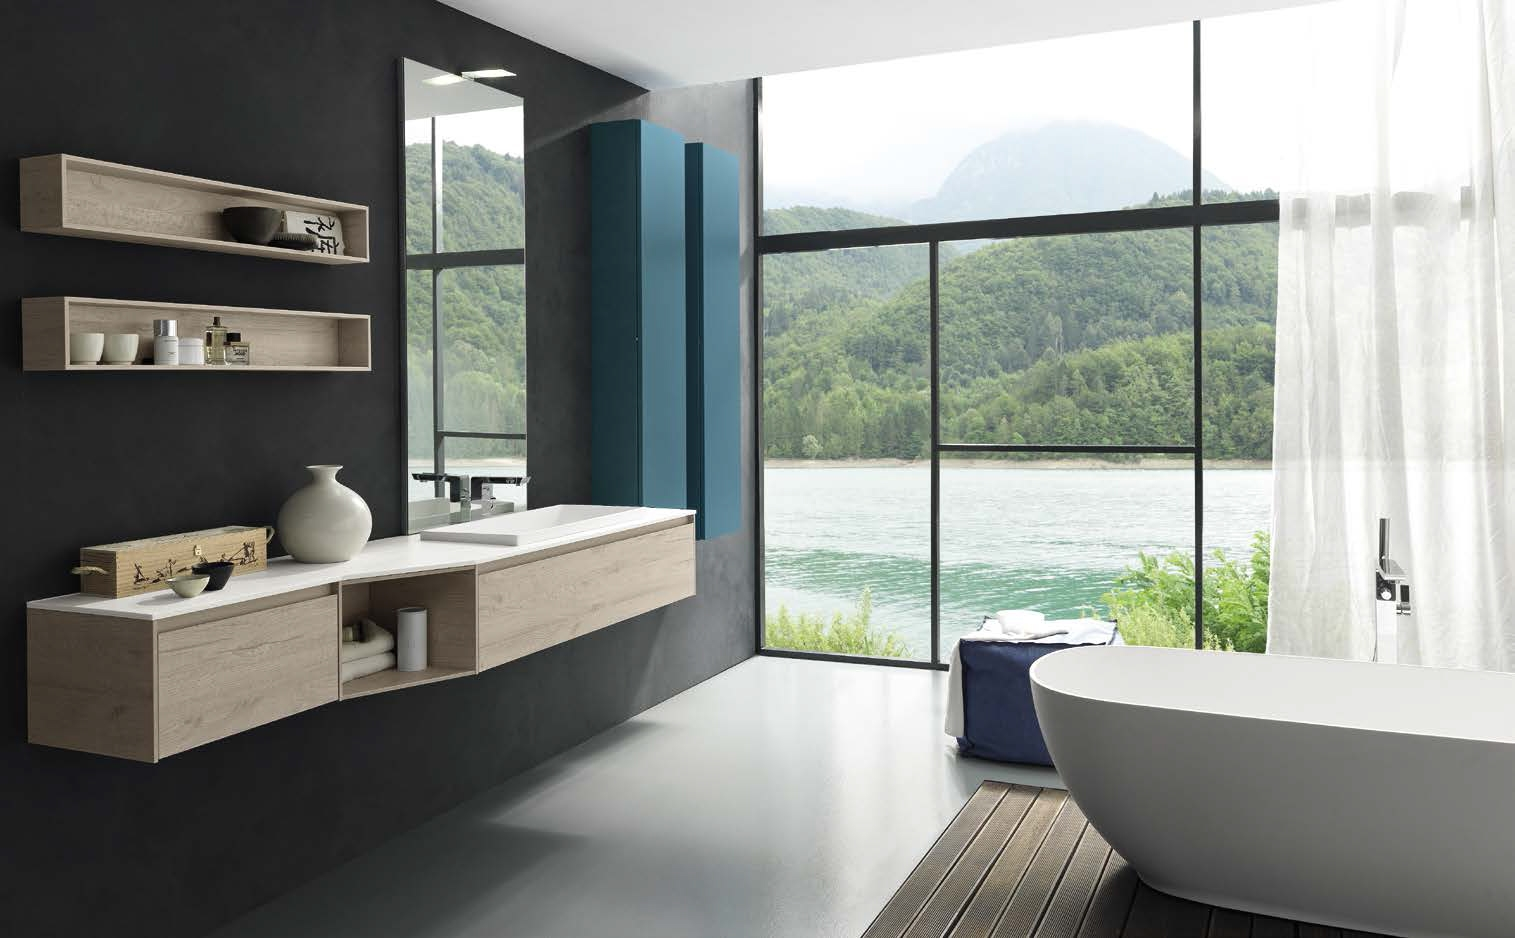 Meuble et vasque salle de bain pas cher valdiz Meuble salle de bain a suspendre pas cher